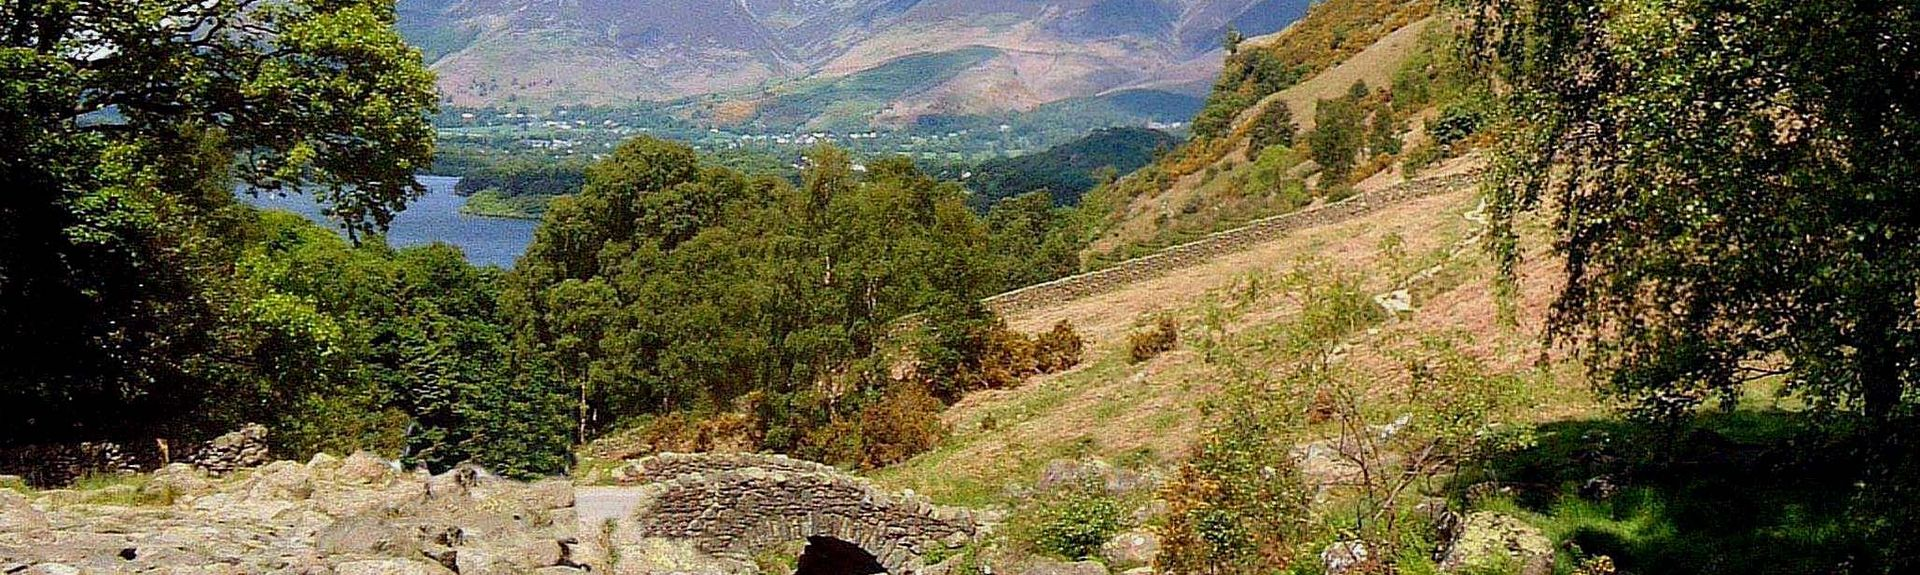 Yanwath and Eamont Bridge, Cumbria, UK